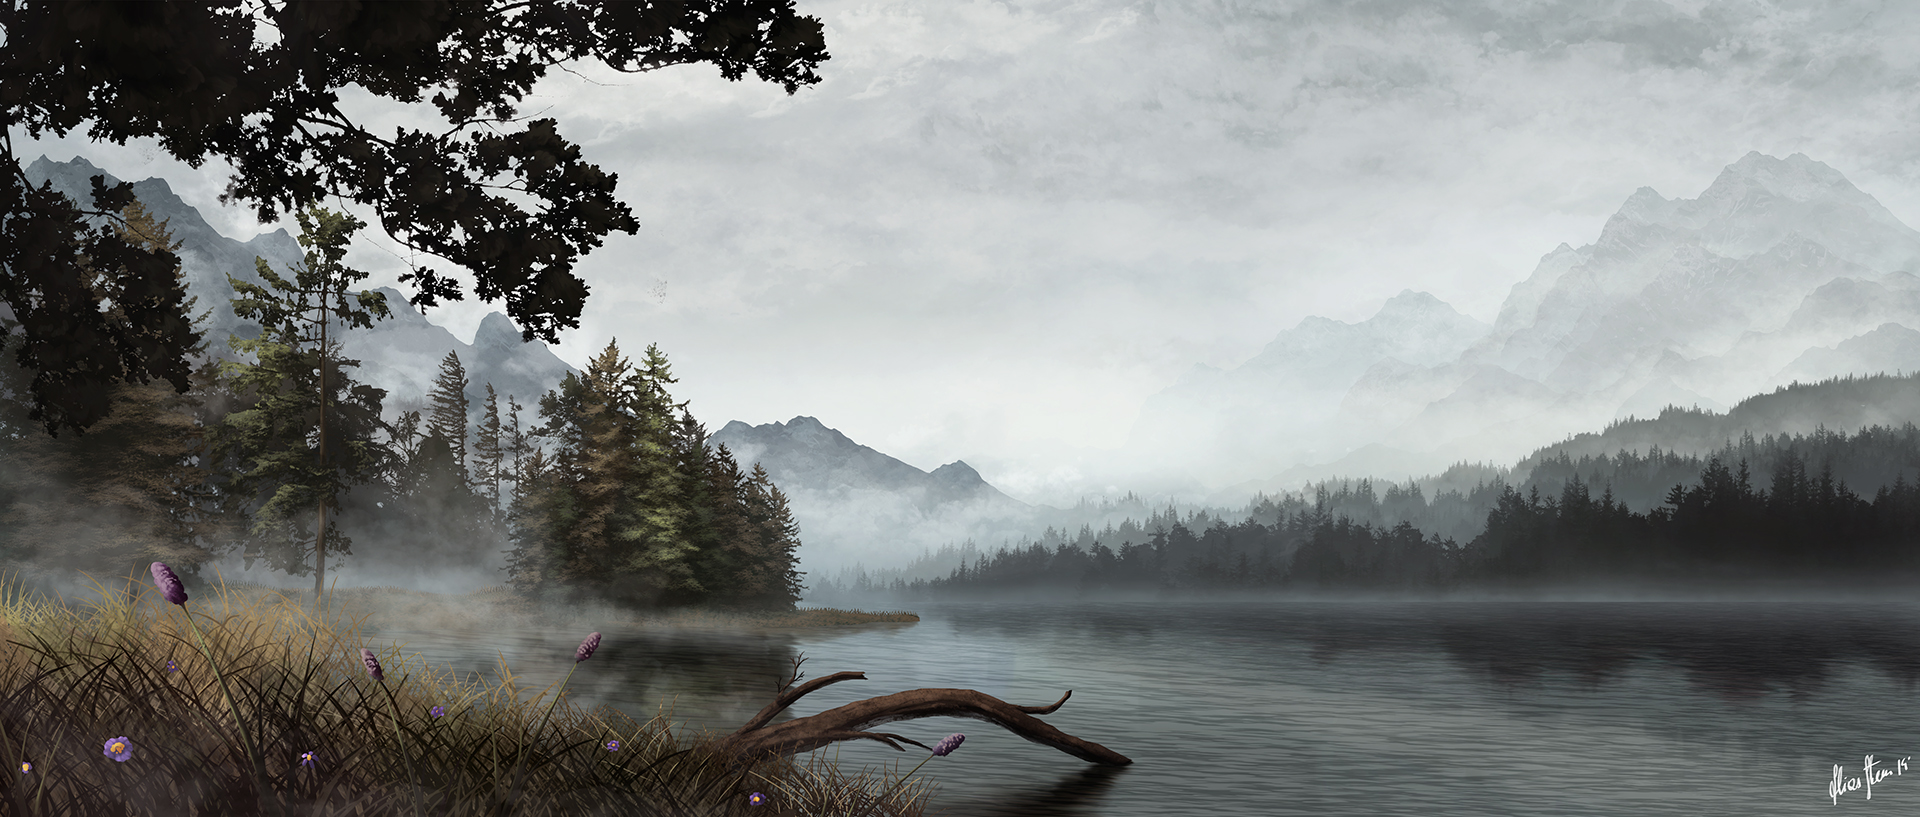 http://orig10.deviantart.net/709f/f/2014/182/7/9/misty_lake_by_lorddoomhammer-d7ovdu0.jpg